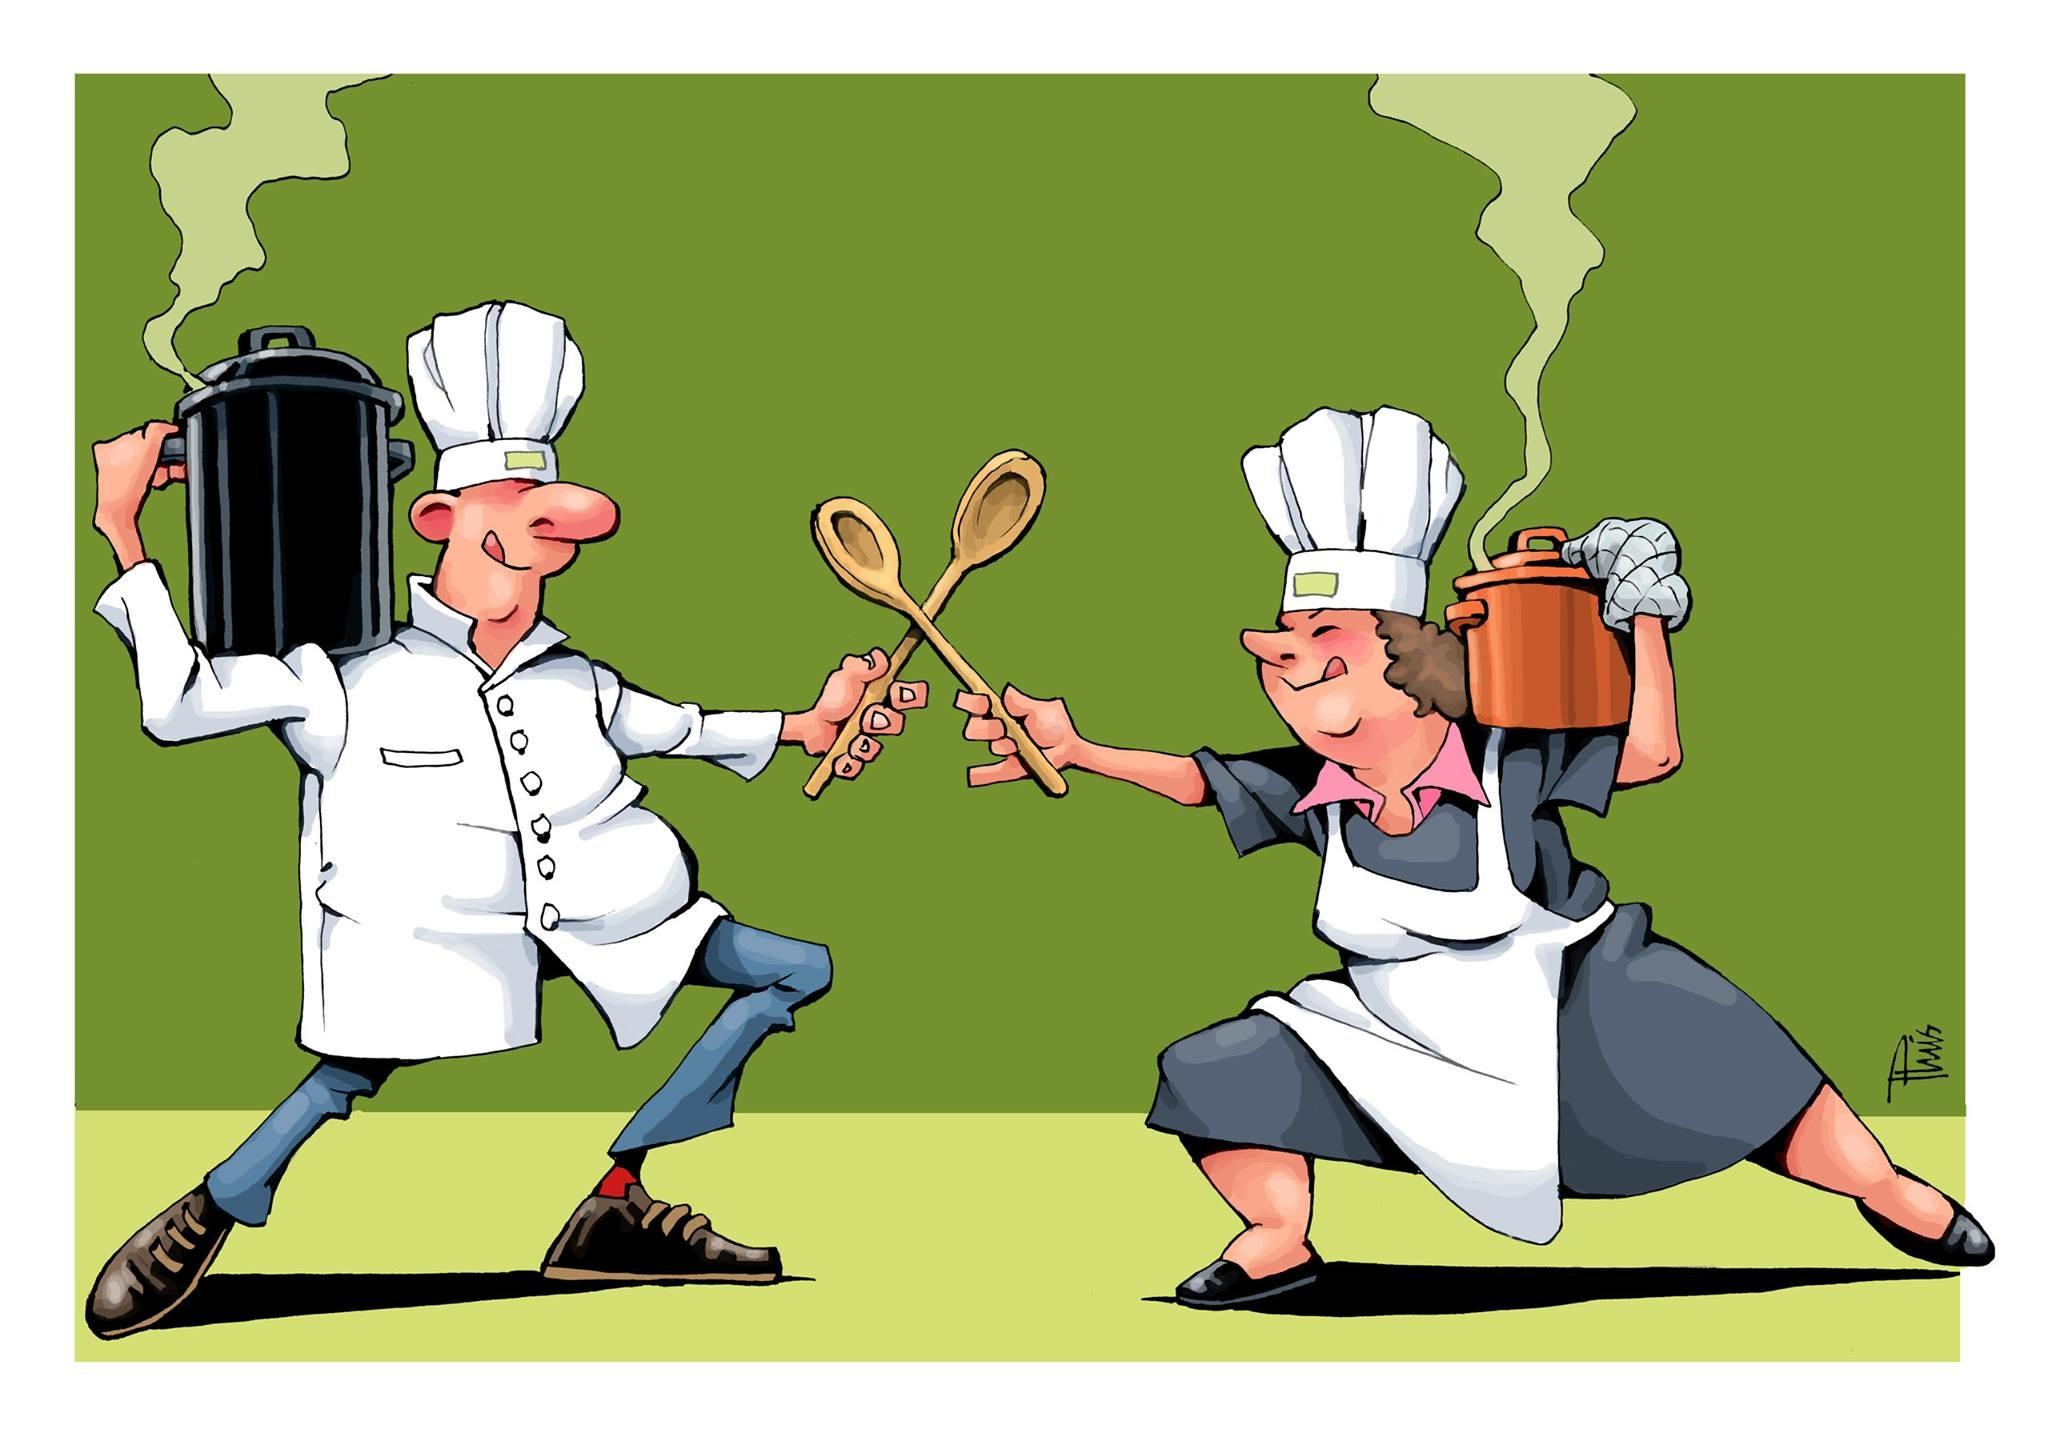 snert koken